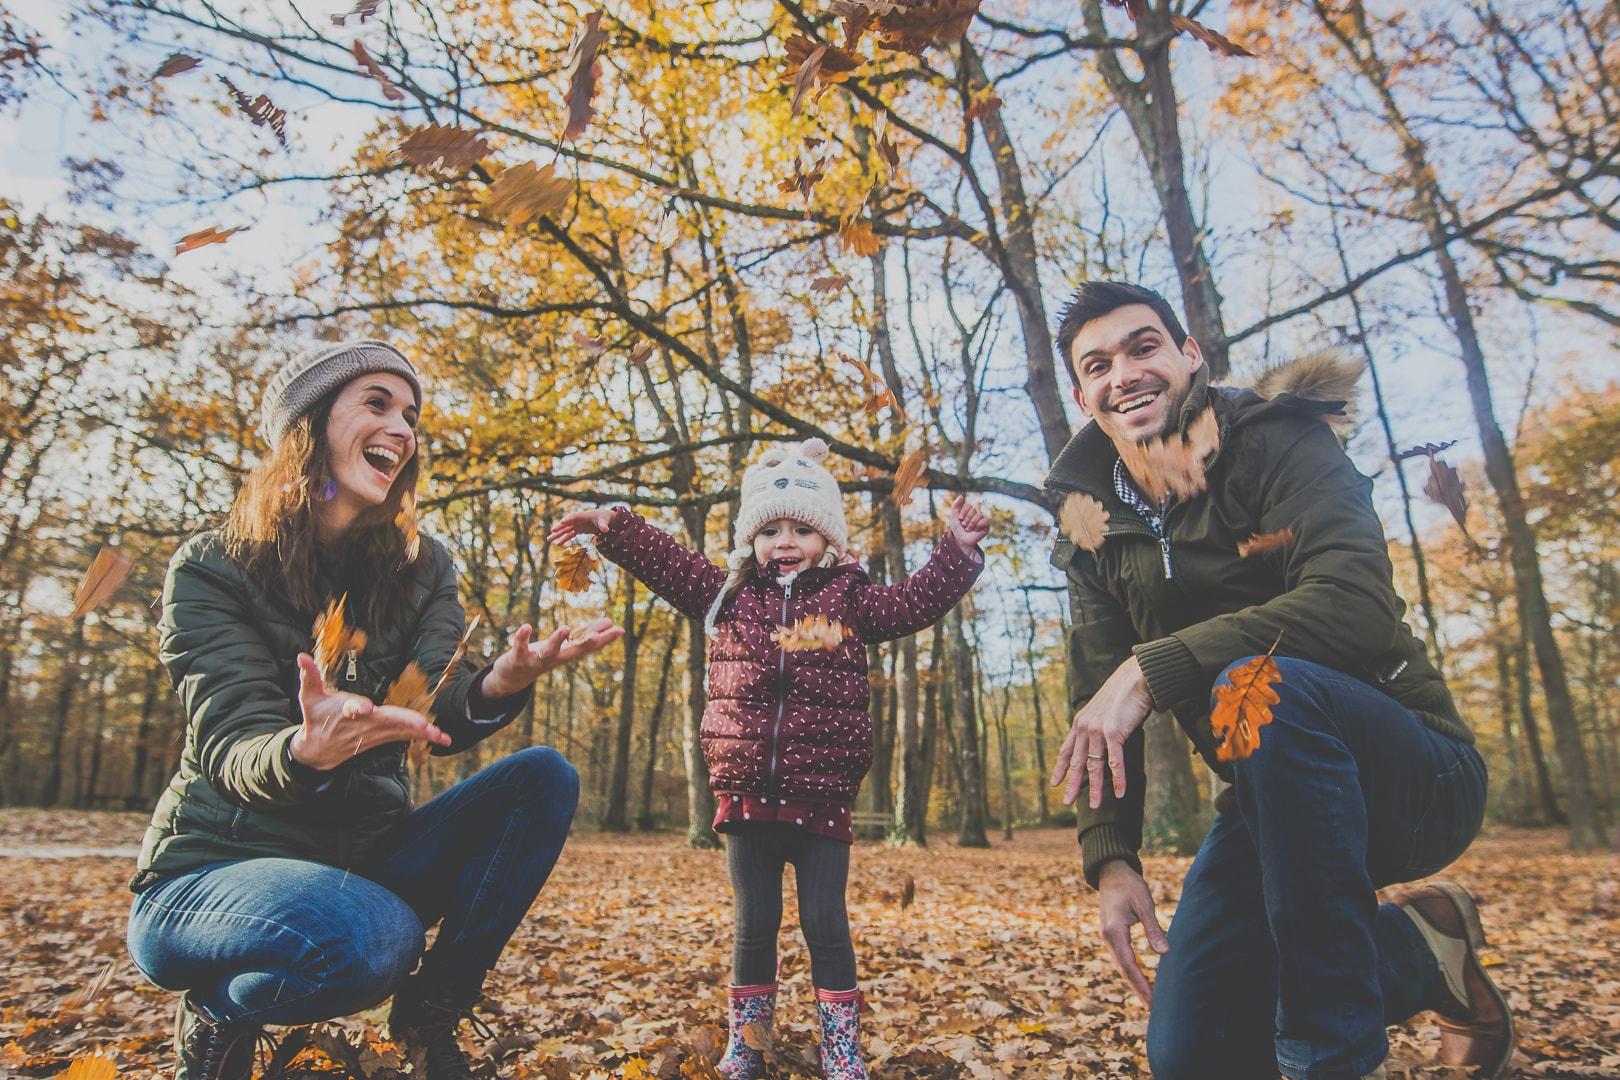 trezors-photography-photographe-professionnel-toulouse-31-enfance-seance-famille-lifestyle (27)